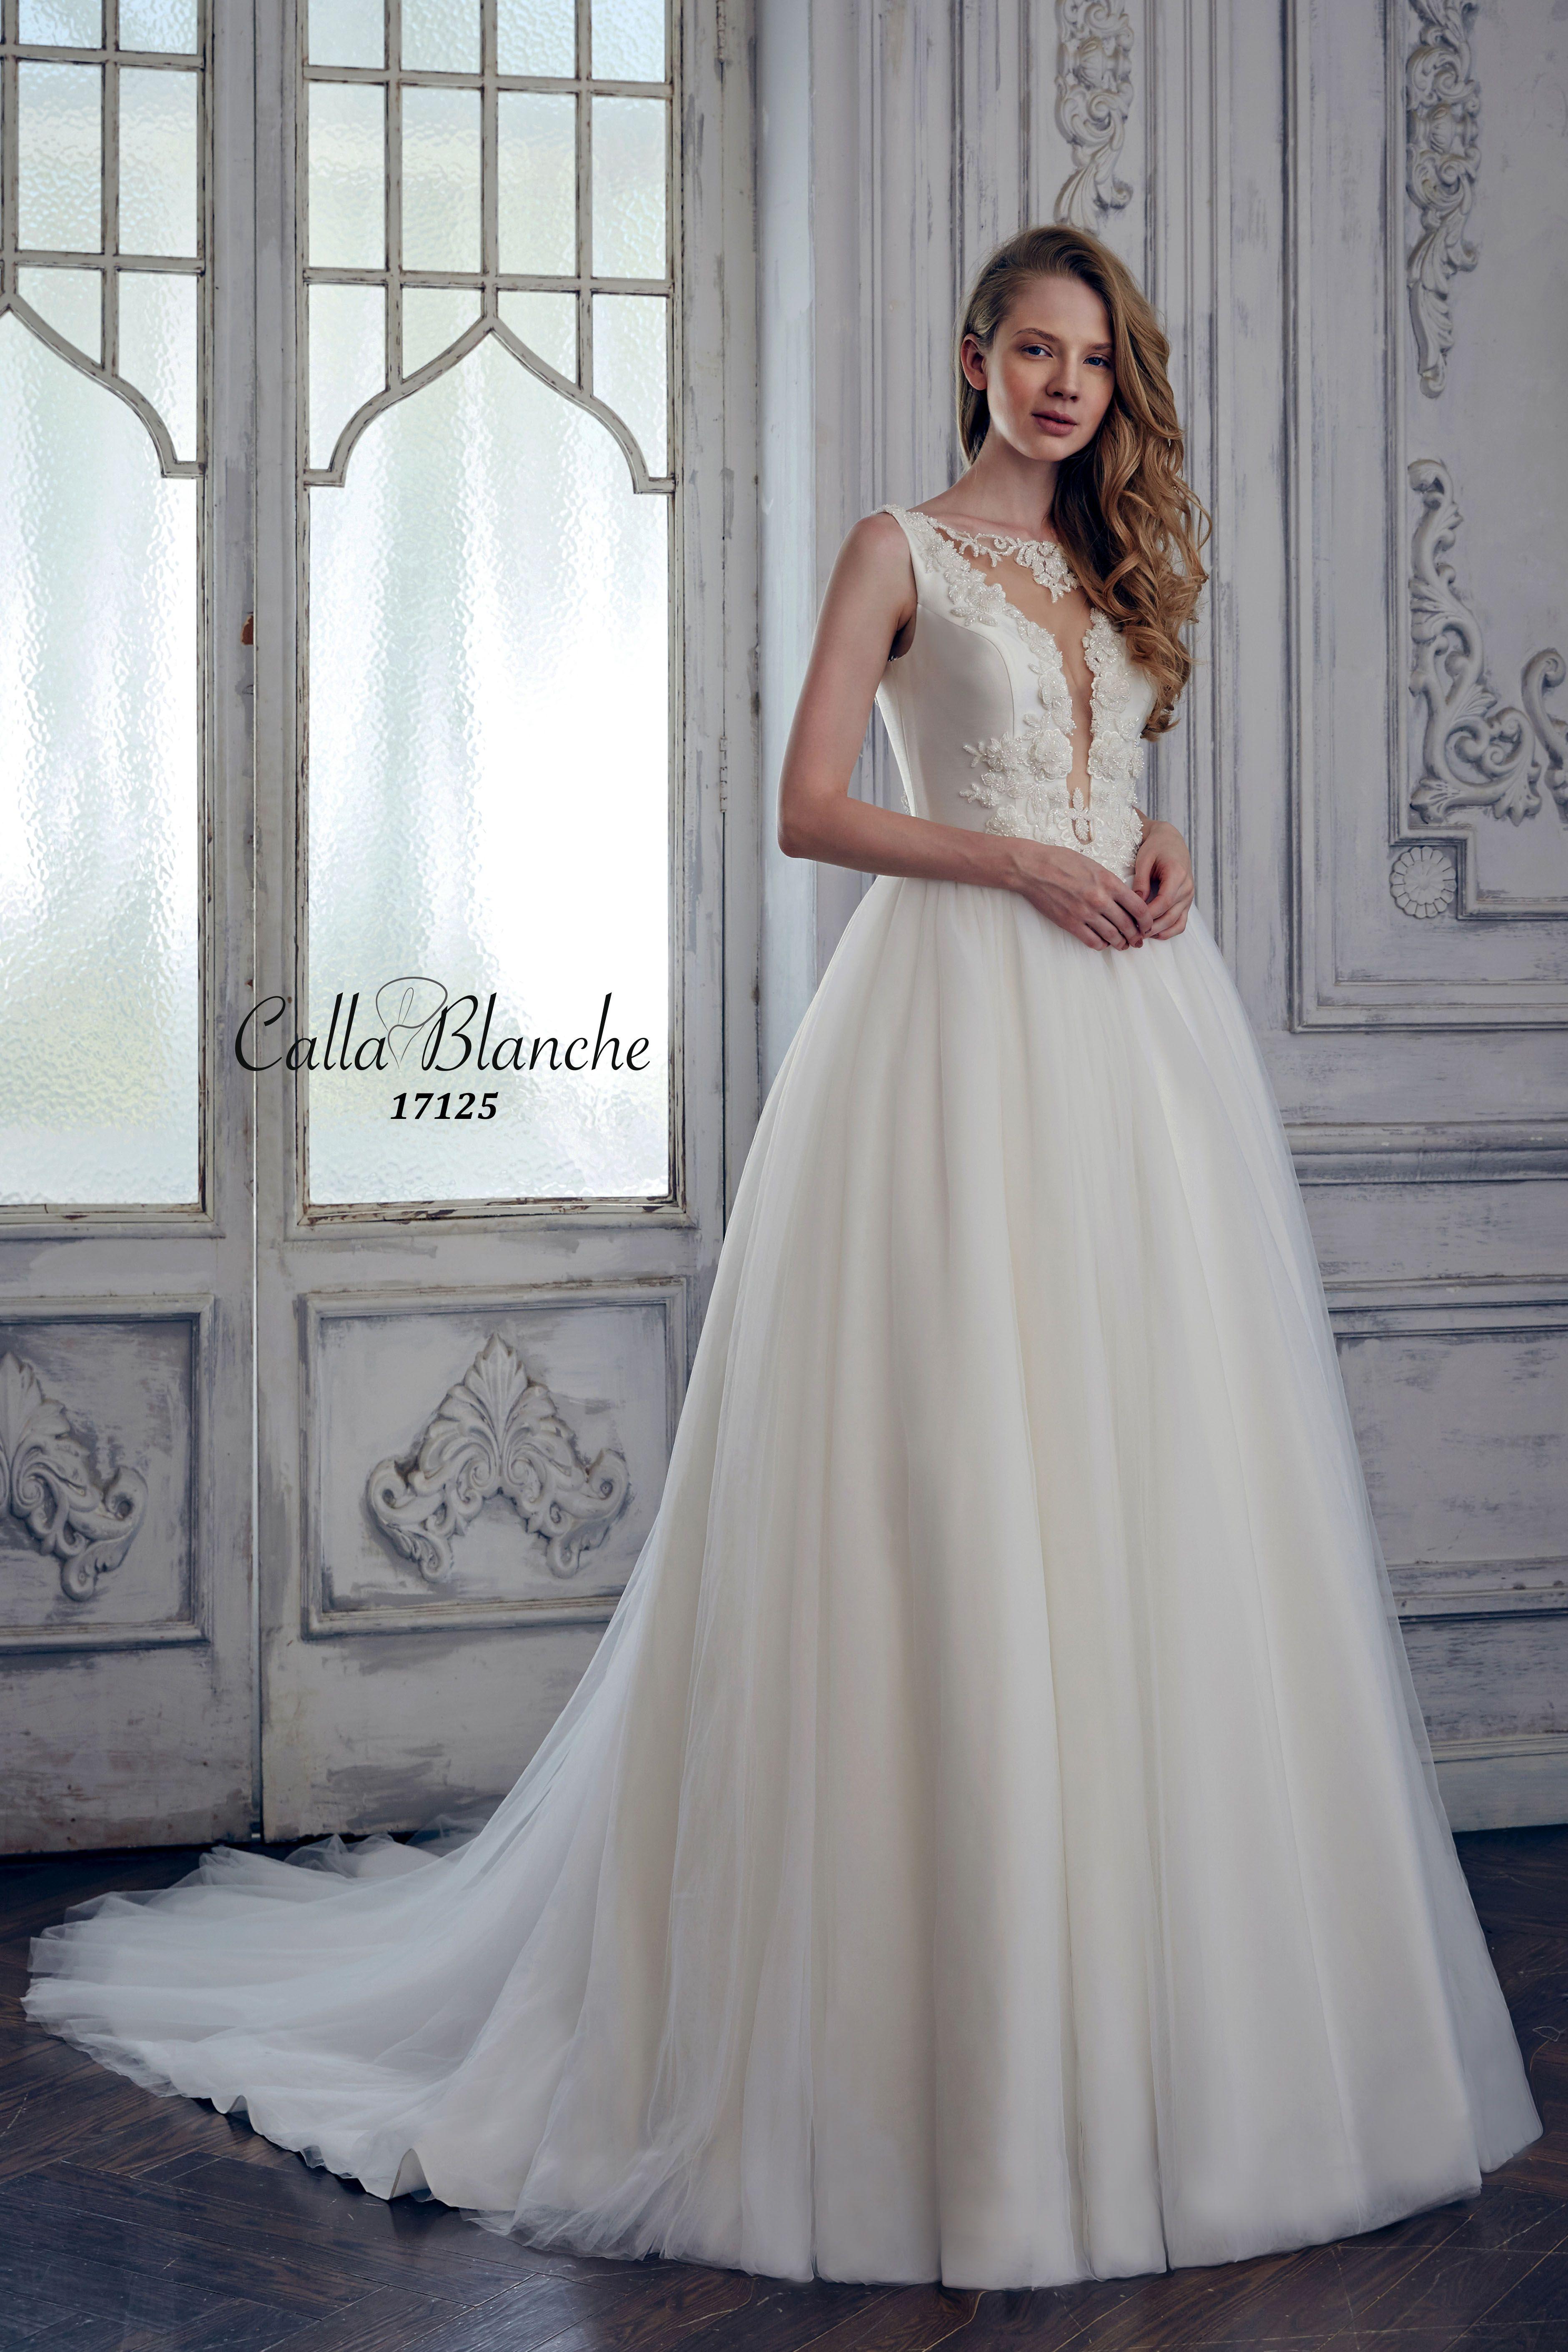 Calla Blanche wedding dress/gown- Blanca, ivory ballgown wedding ...